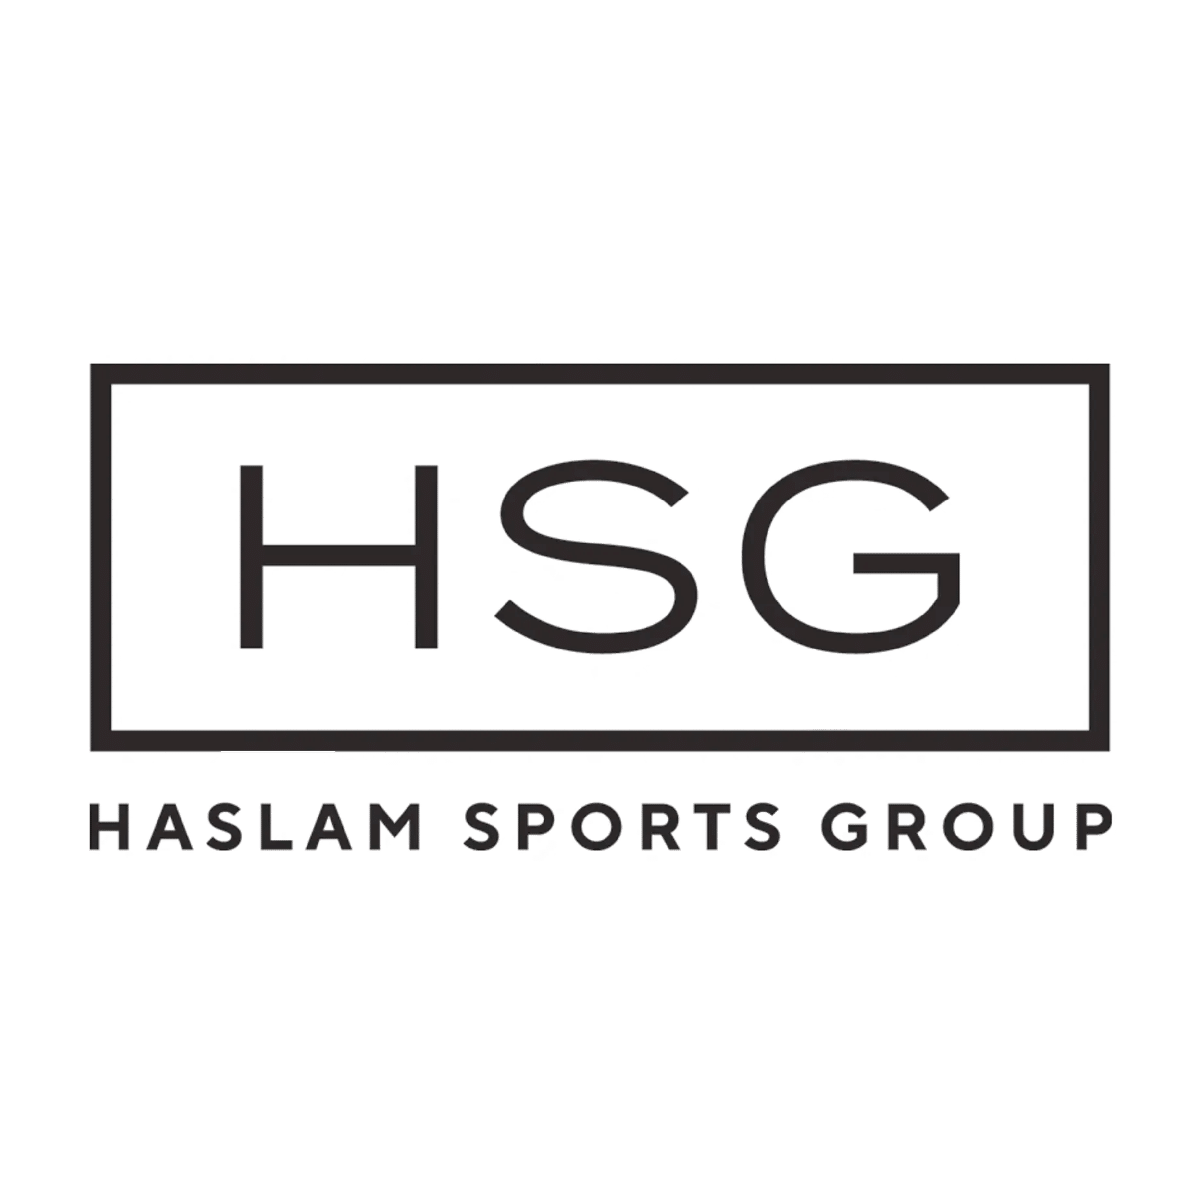 Haslam Sports Group Logo